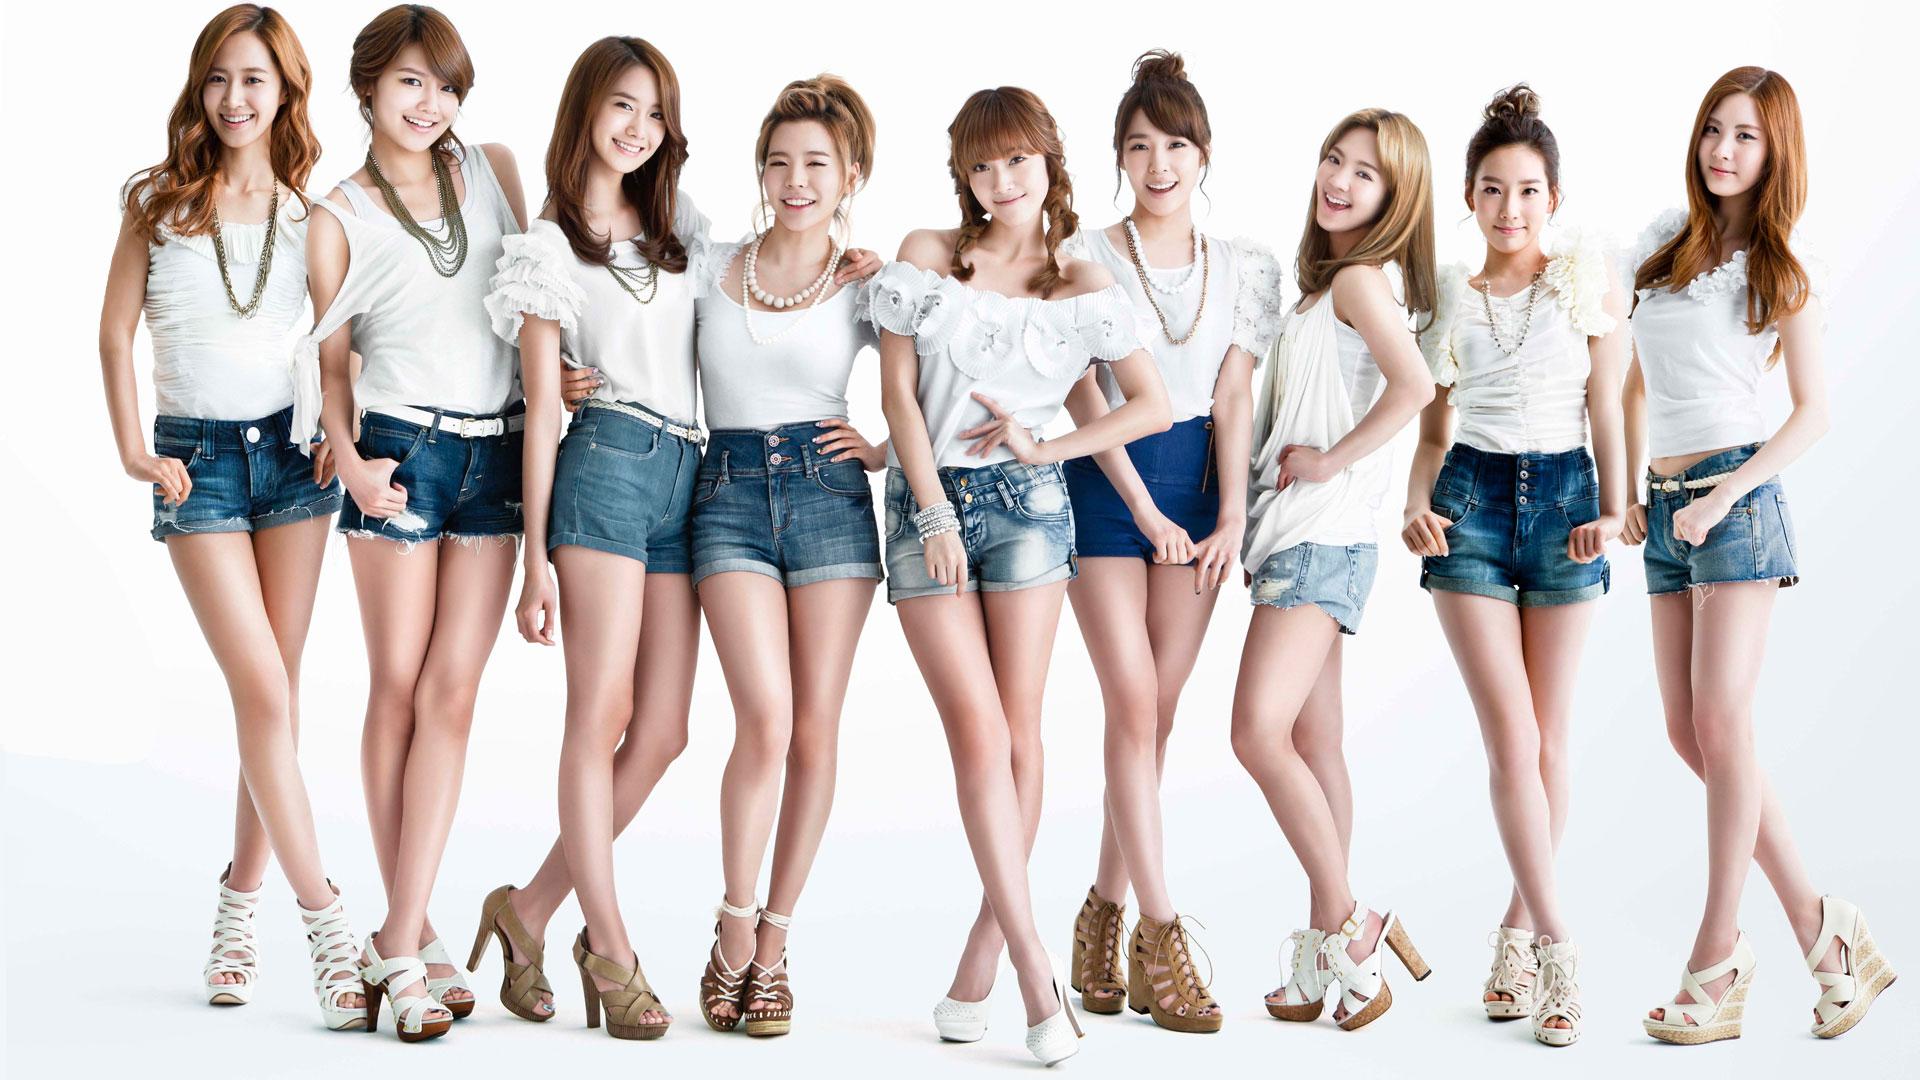 taeyeon and jessica relationship marketing